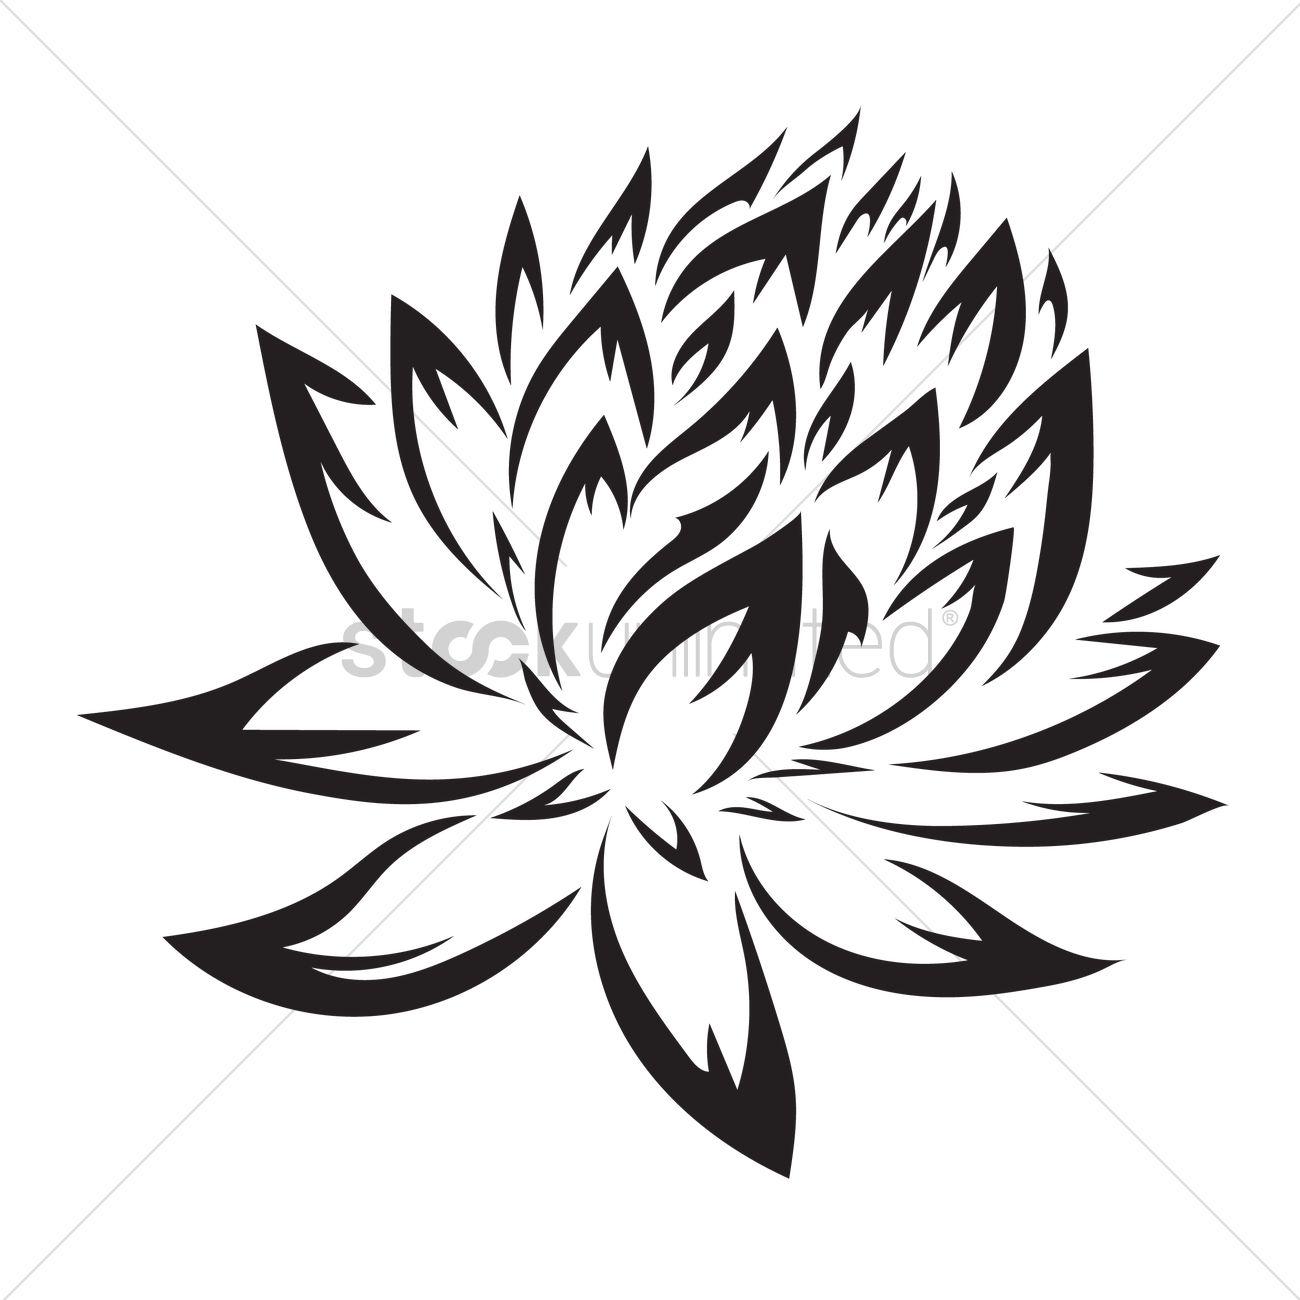 Lotus Tattoo Design Vector Image 1434417 Stockunlimited